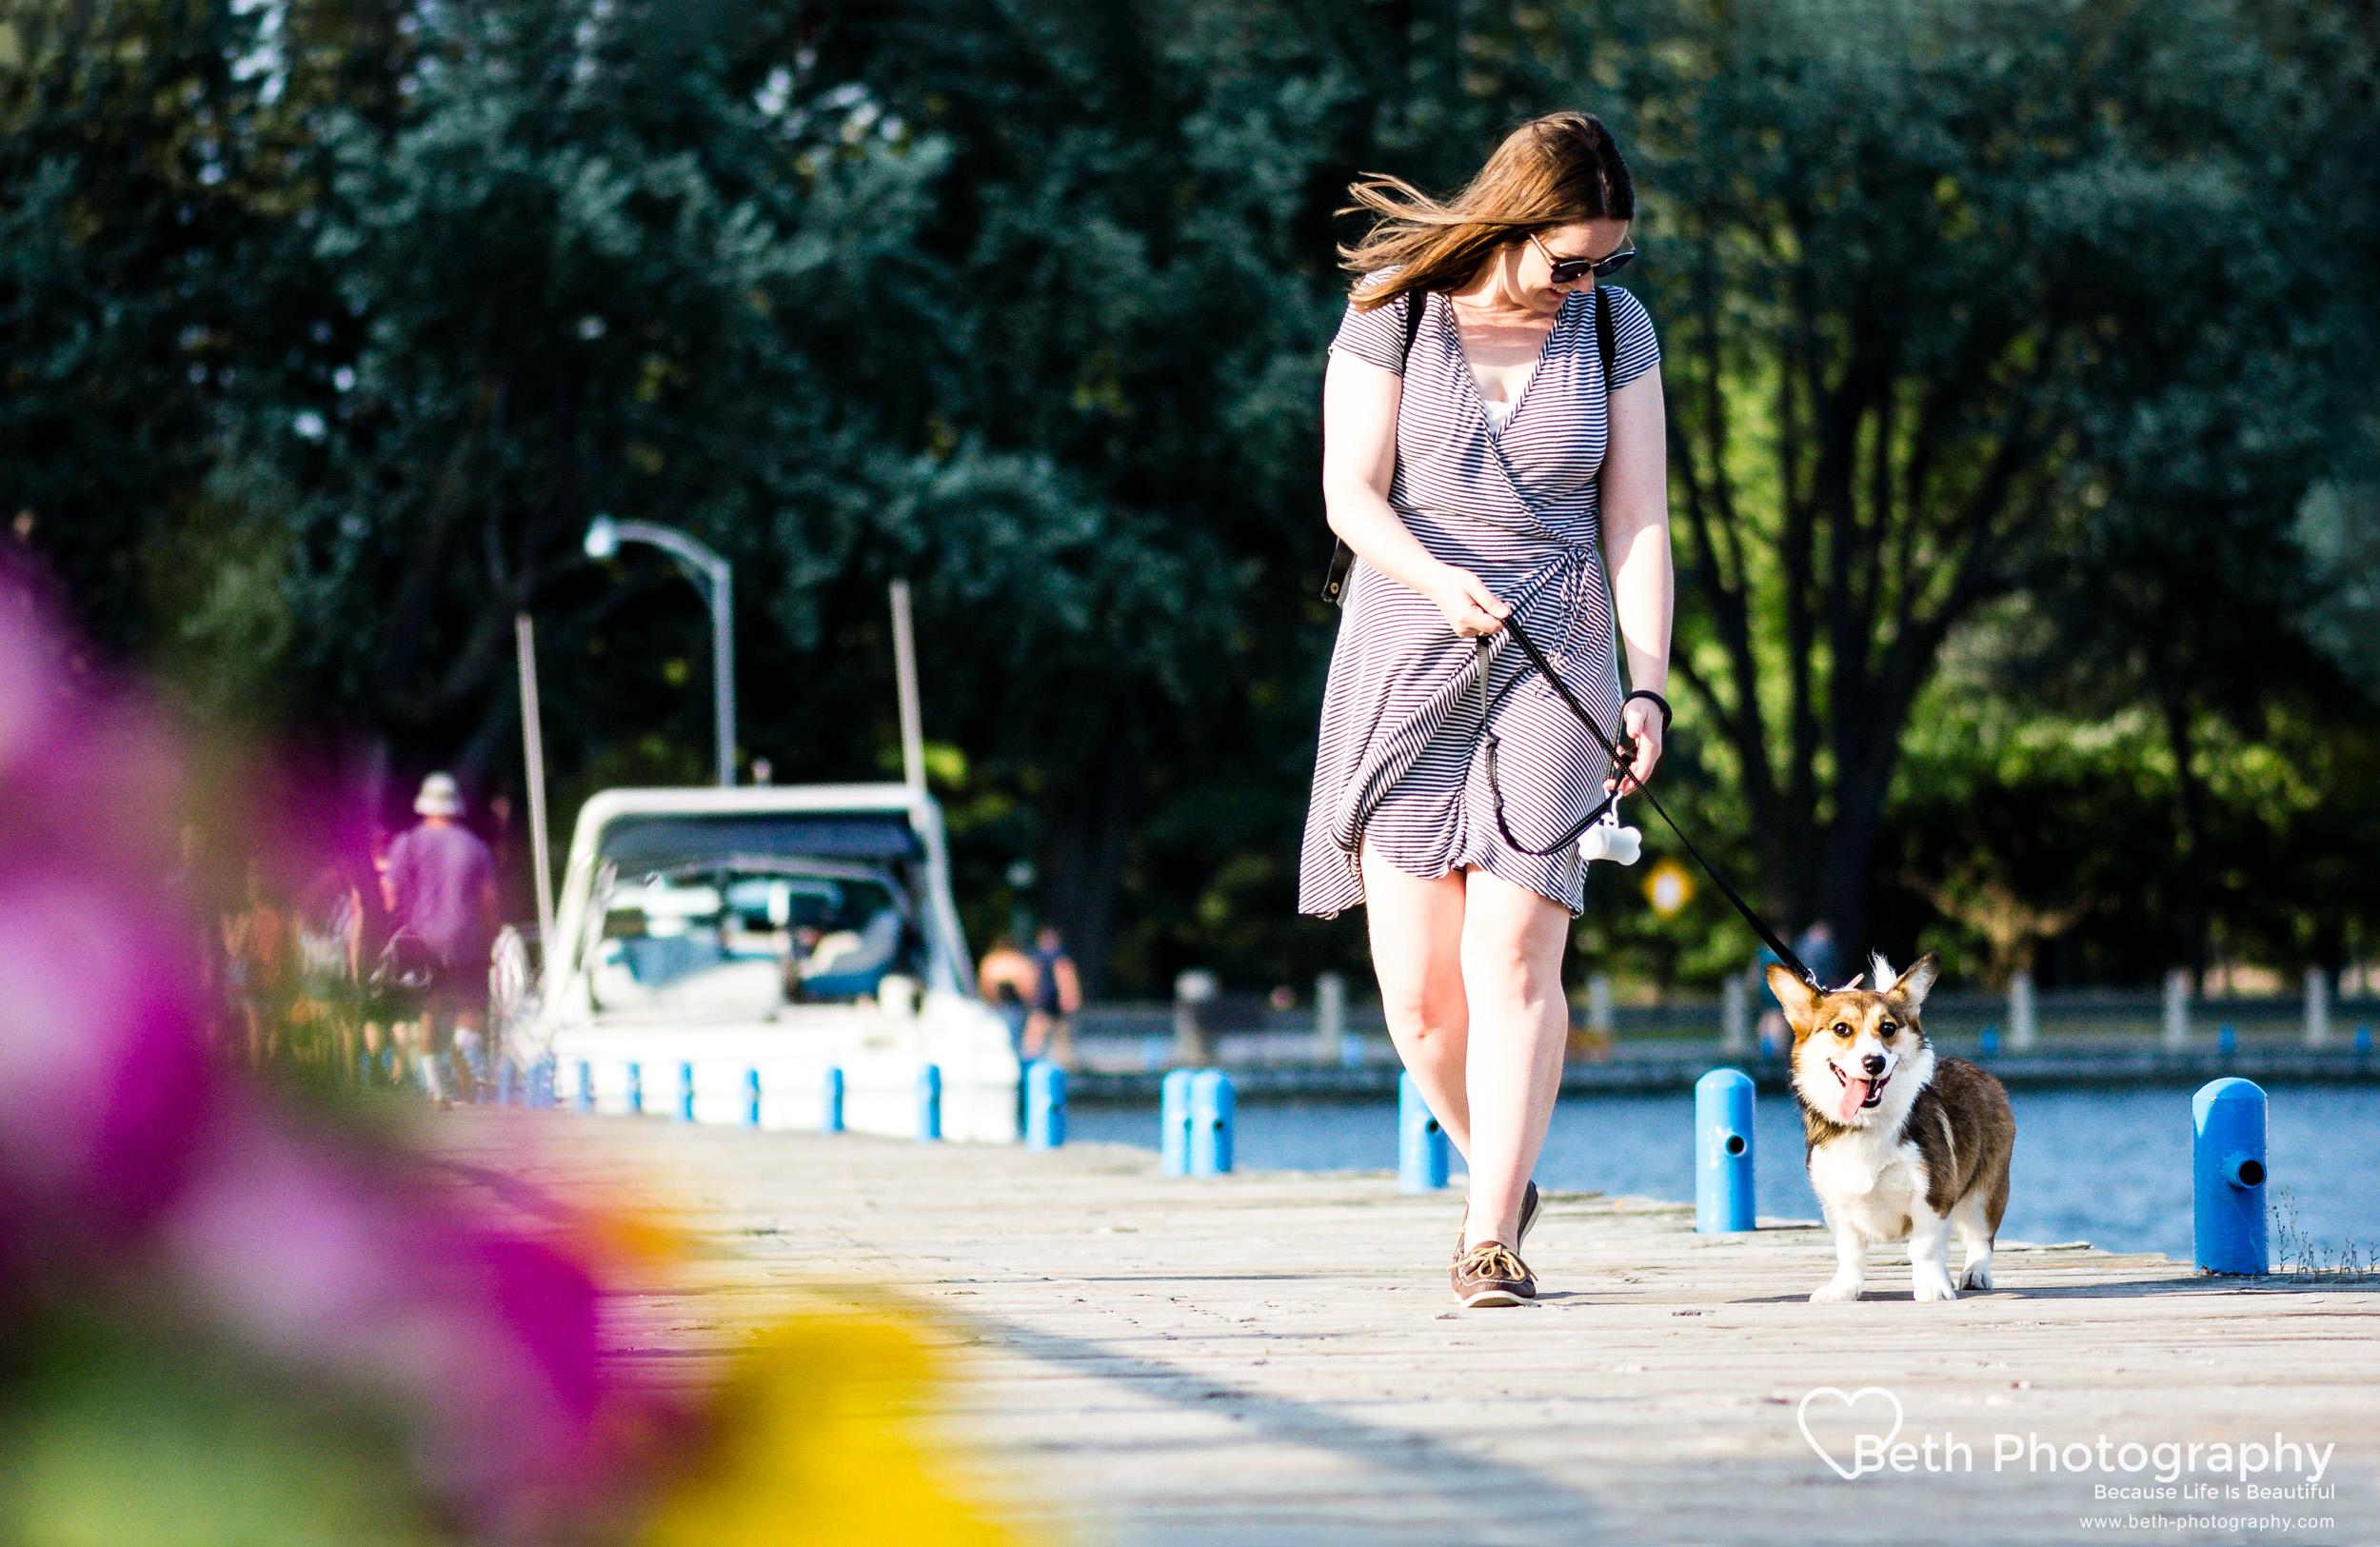 Beth Photography - Pet Photographer -Servicing Ottawa to Cornwall-4.jpg